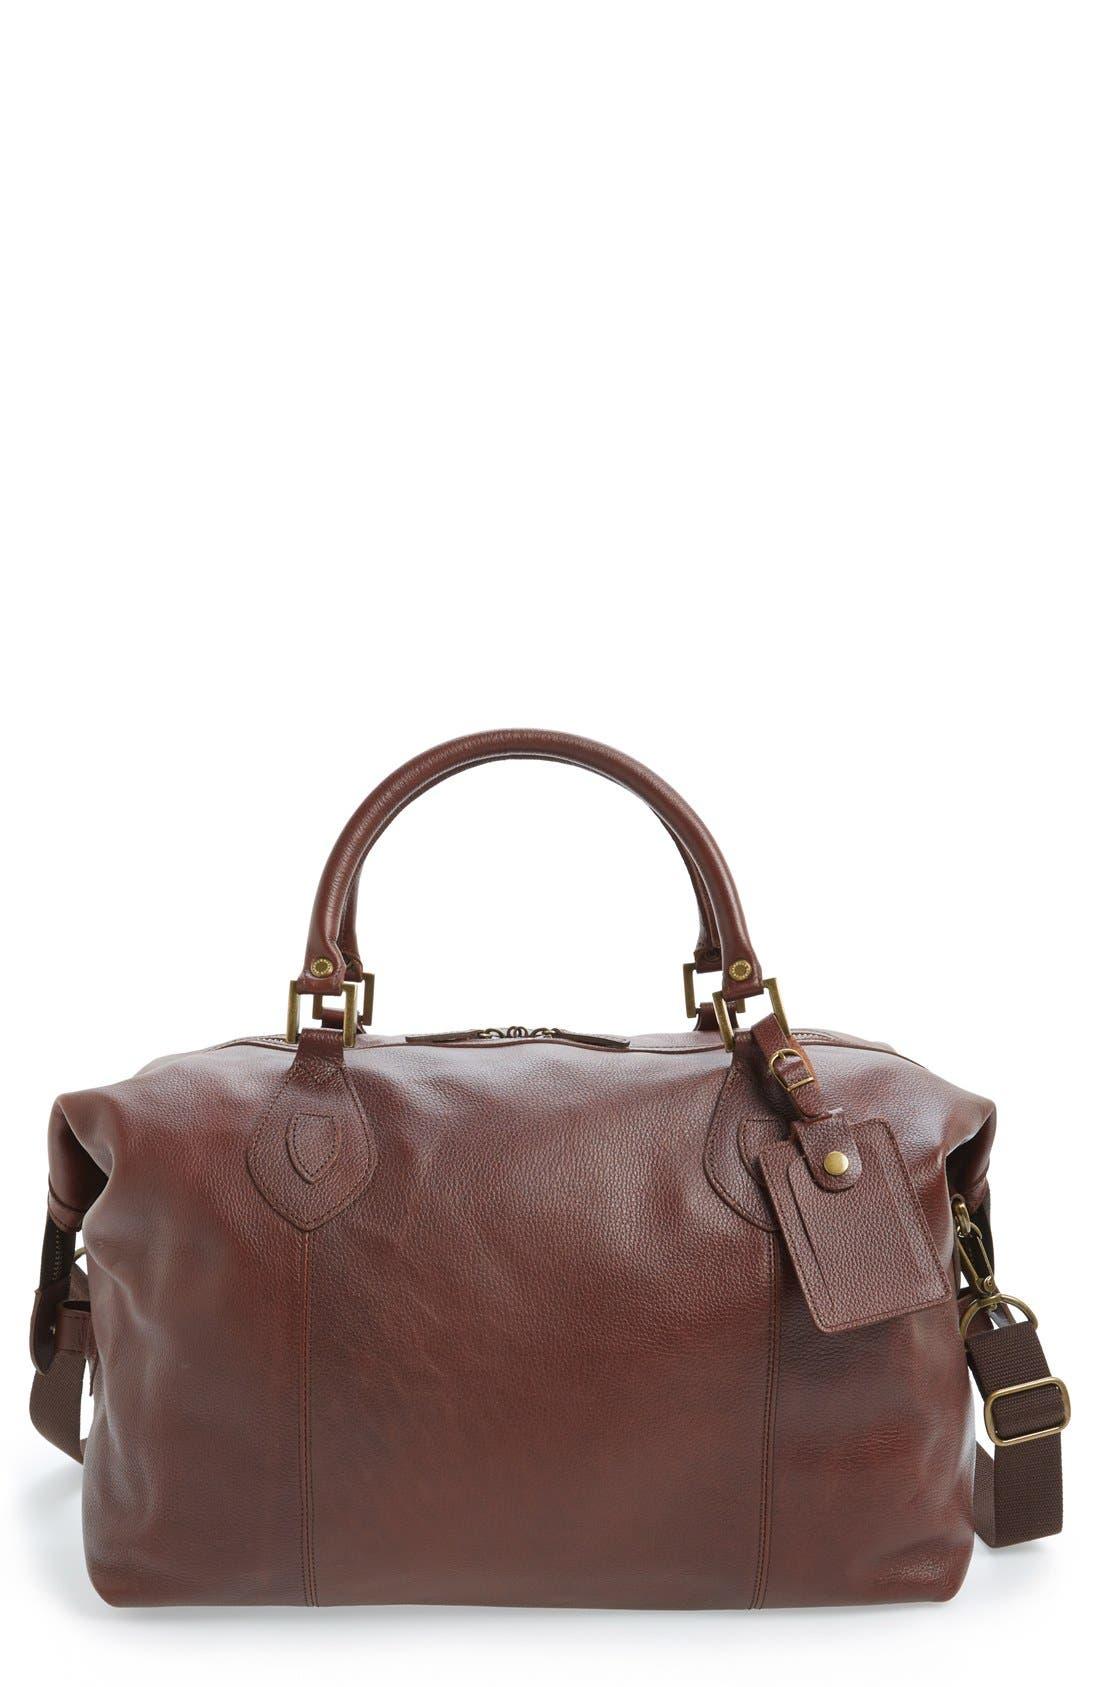 BARBOUR, Leather Travel Bag, Main thumbnail 1, color, DARK BROWN